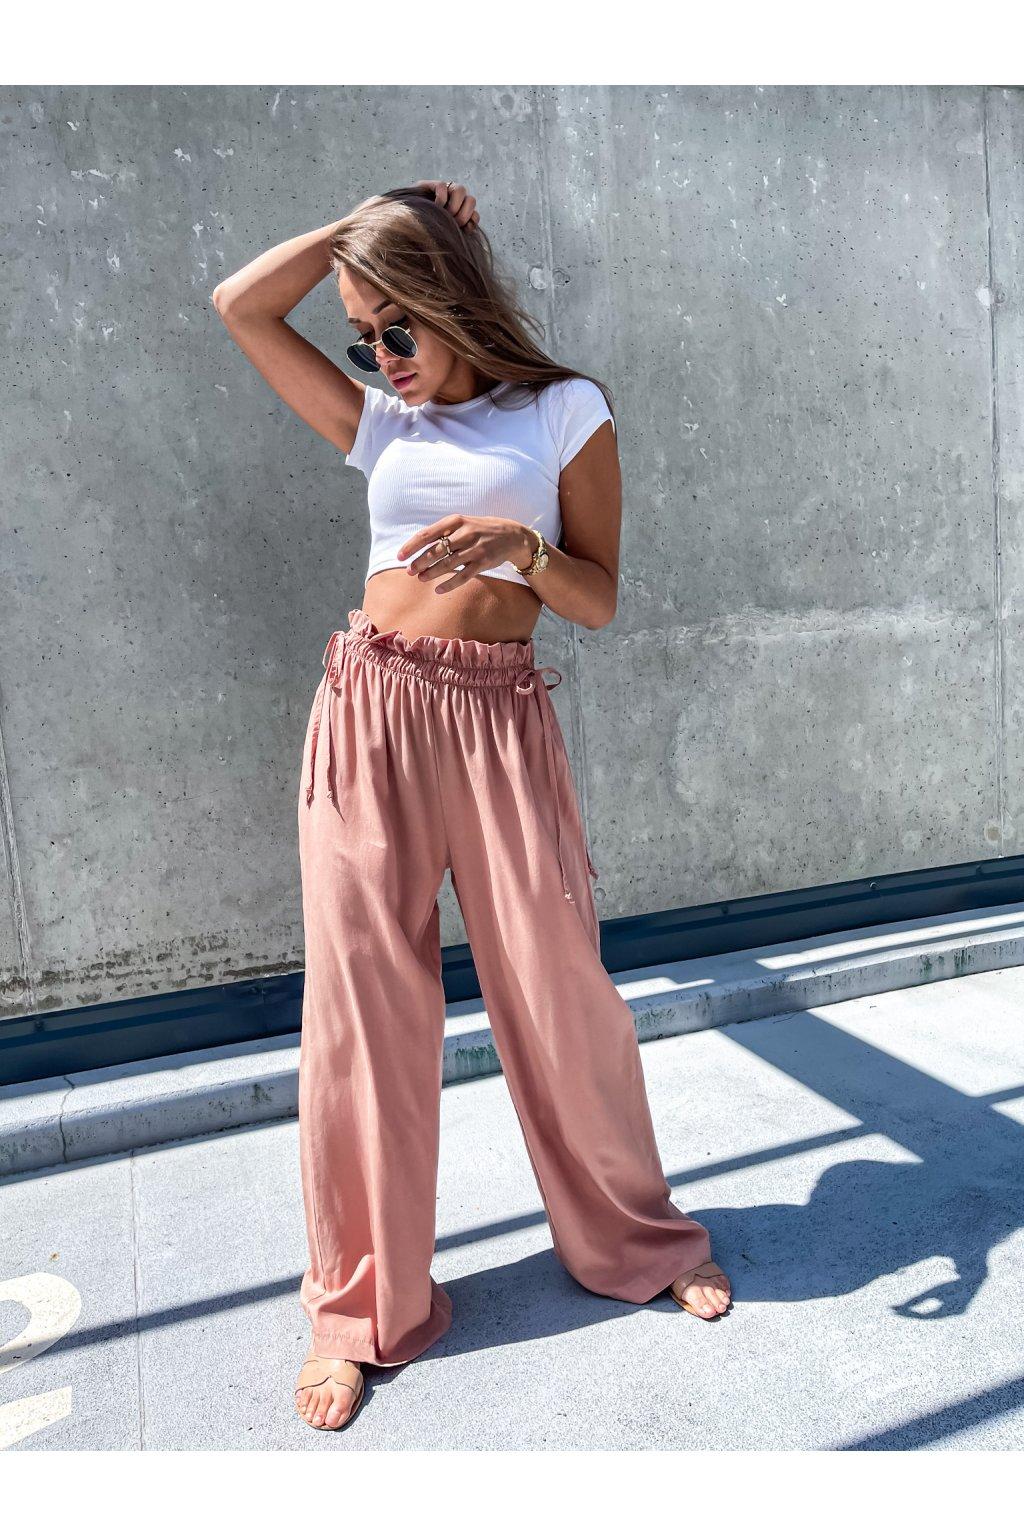 damske kalhoty amy powder pink eshopat cz 2